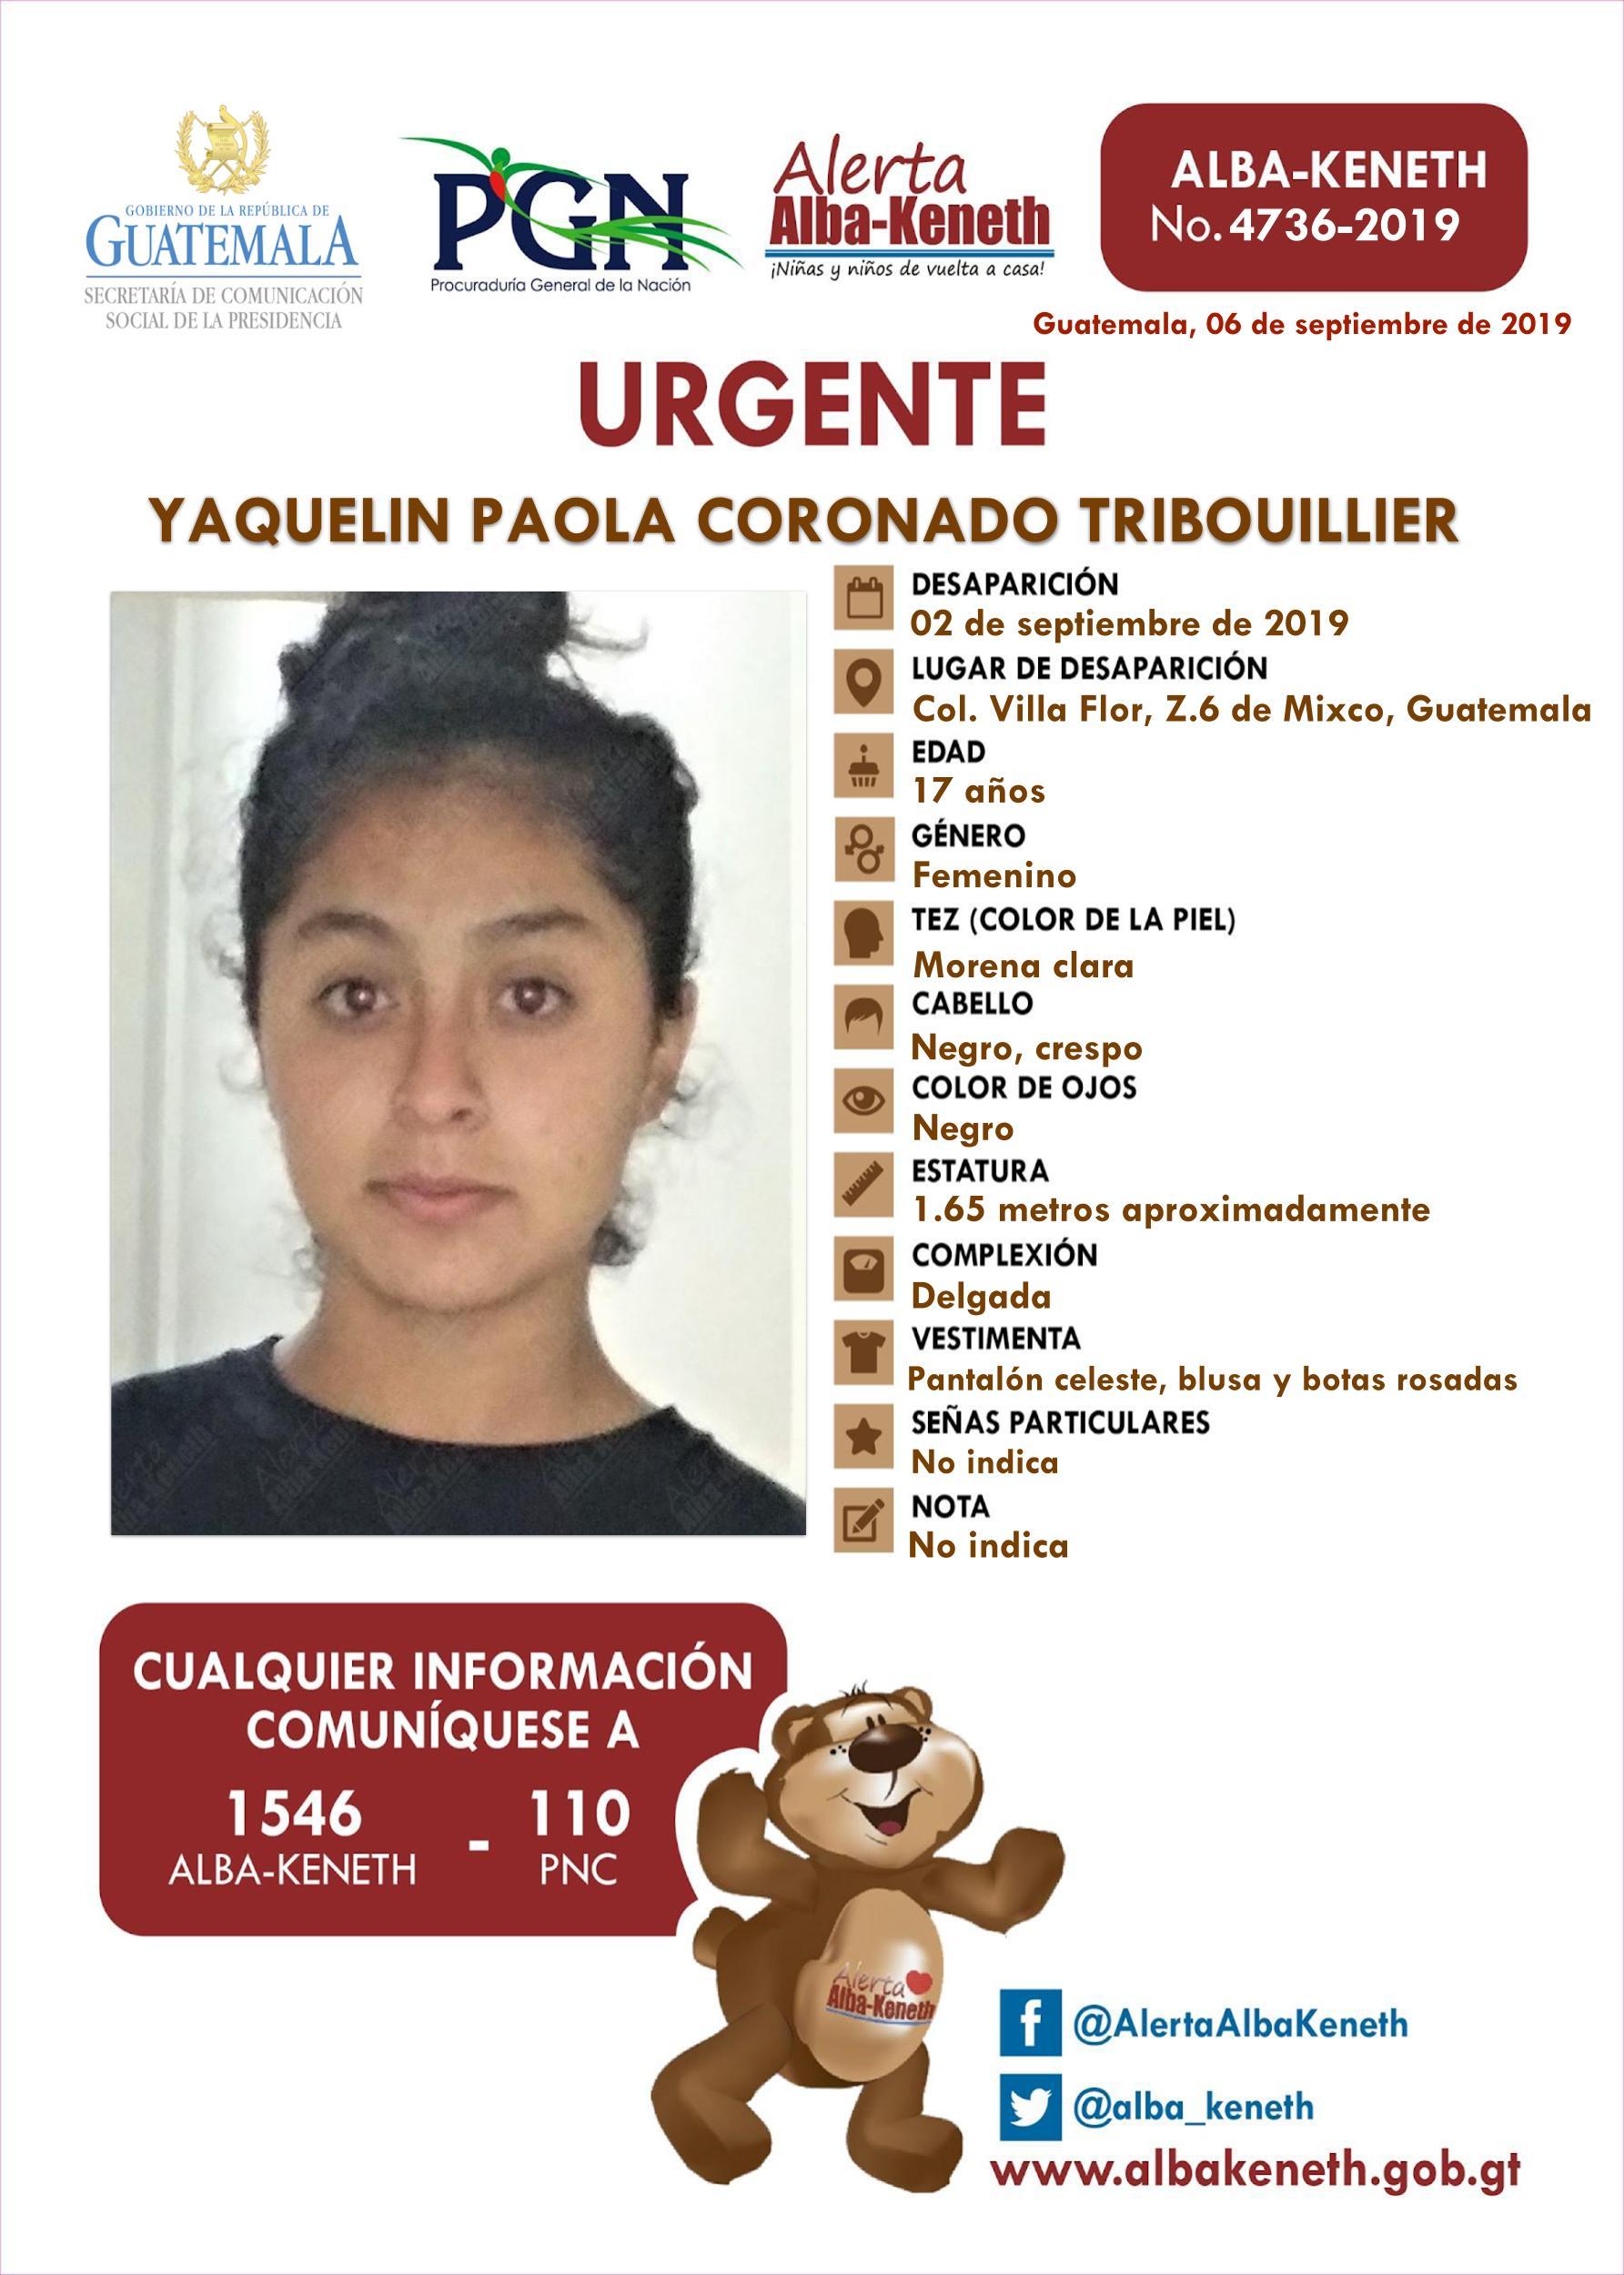 Yaquelin Paola Coronado Tribouillier